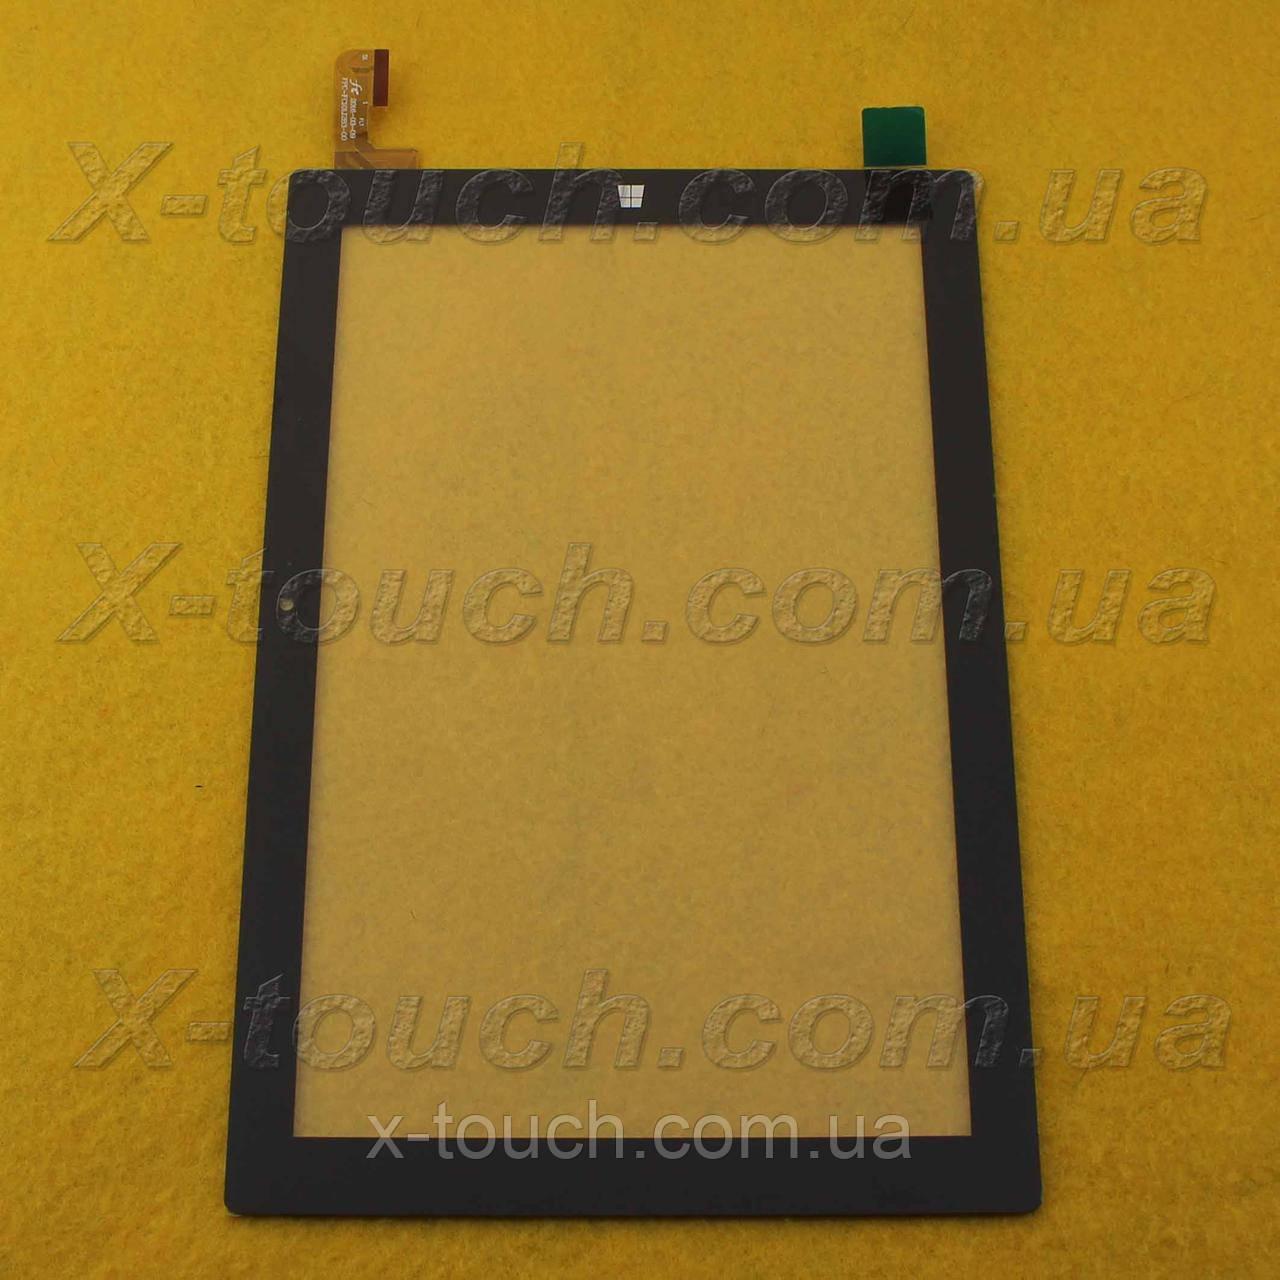 Тачскрин, сенсор FPC-FC101J283-00 для планшета